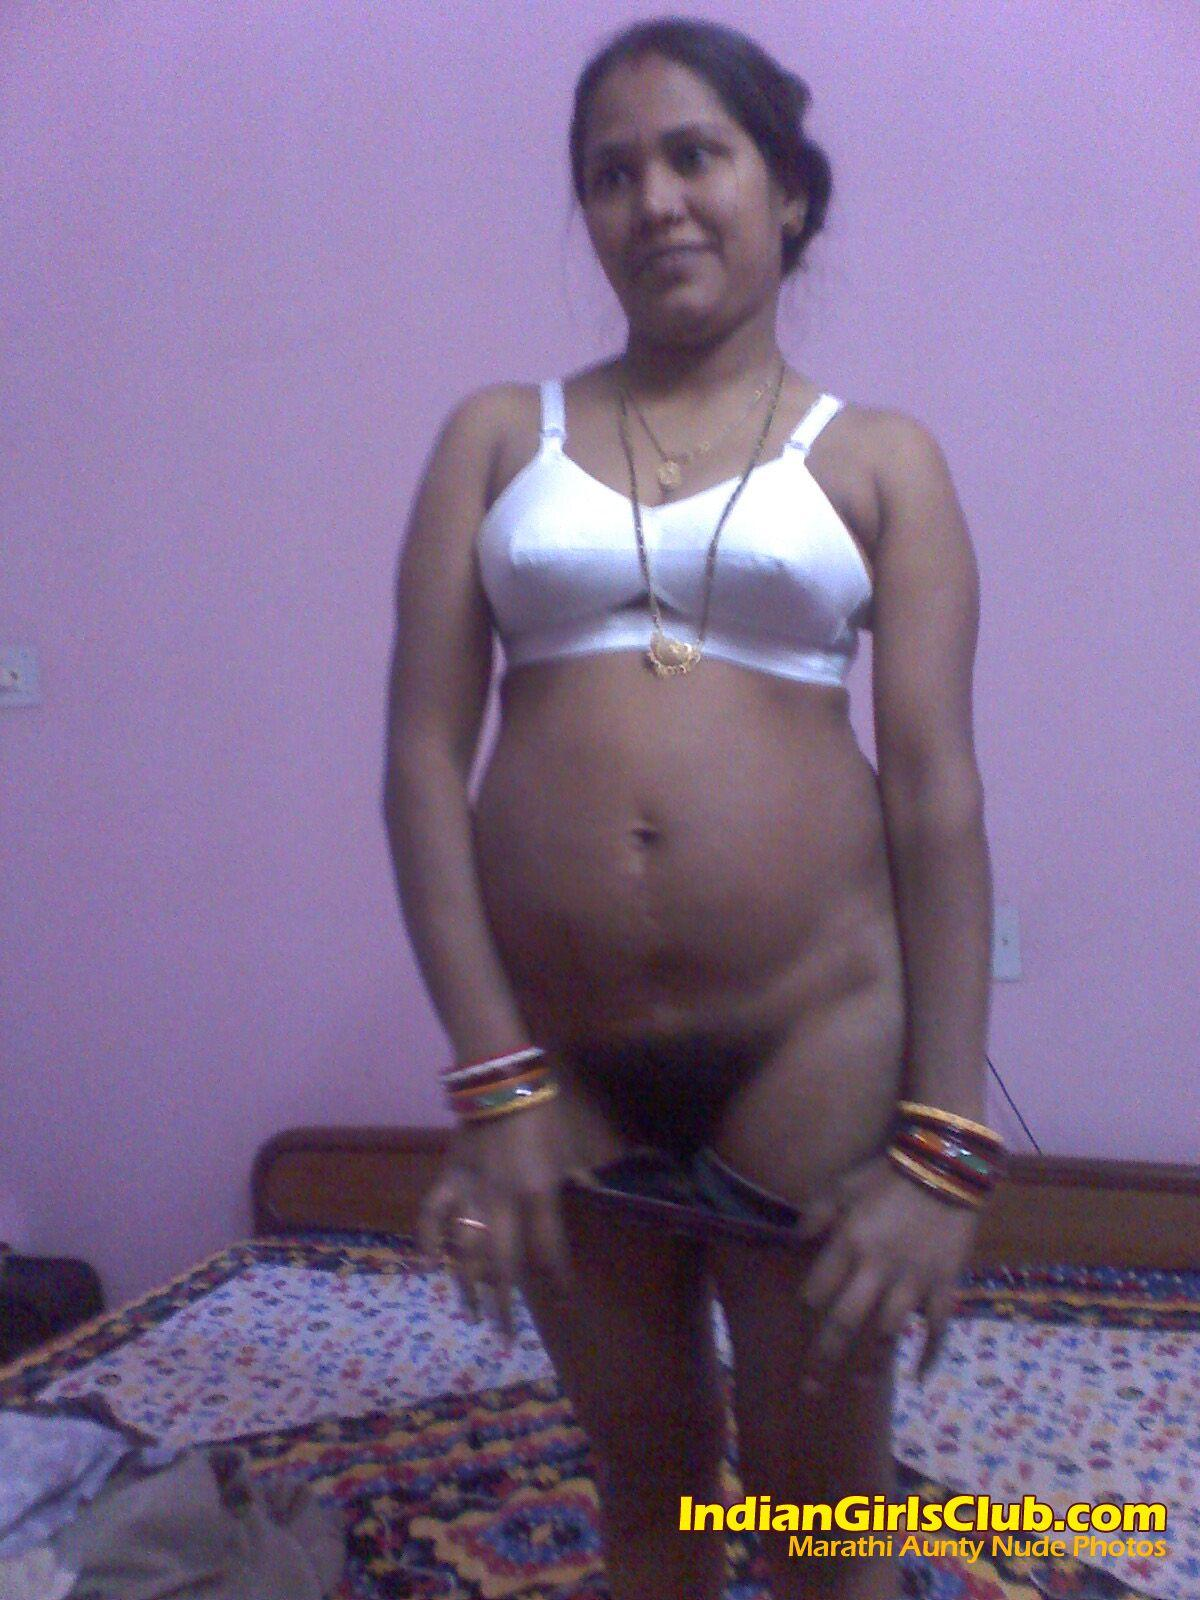 Marathi girl fucked in open place